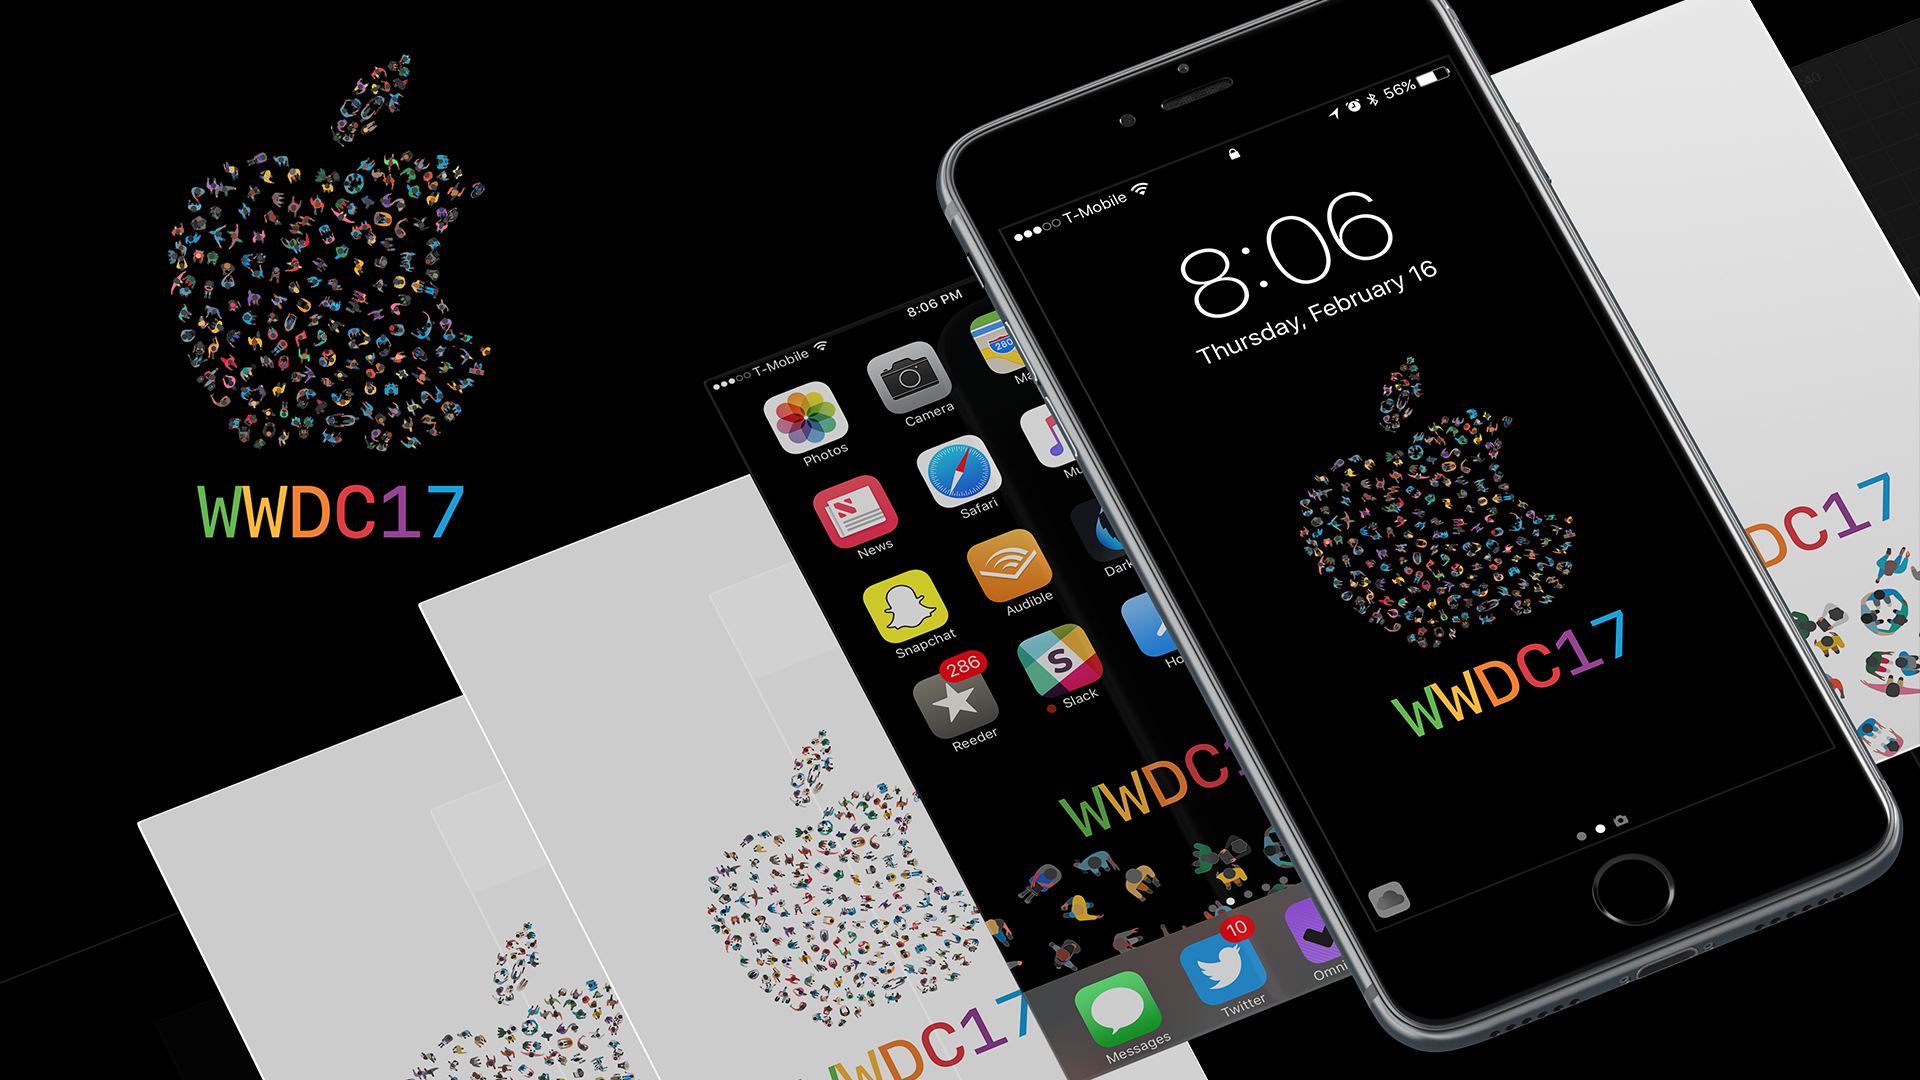 WWDC 2017 Wallpapers – BirchTree